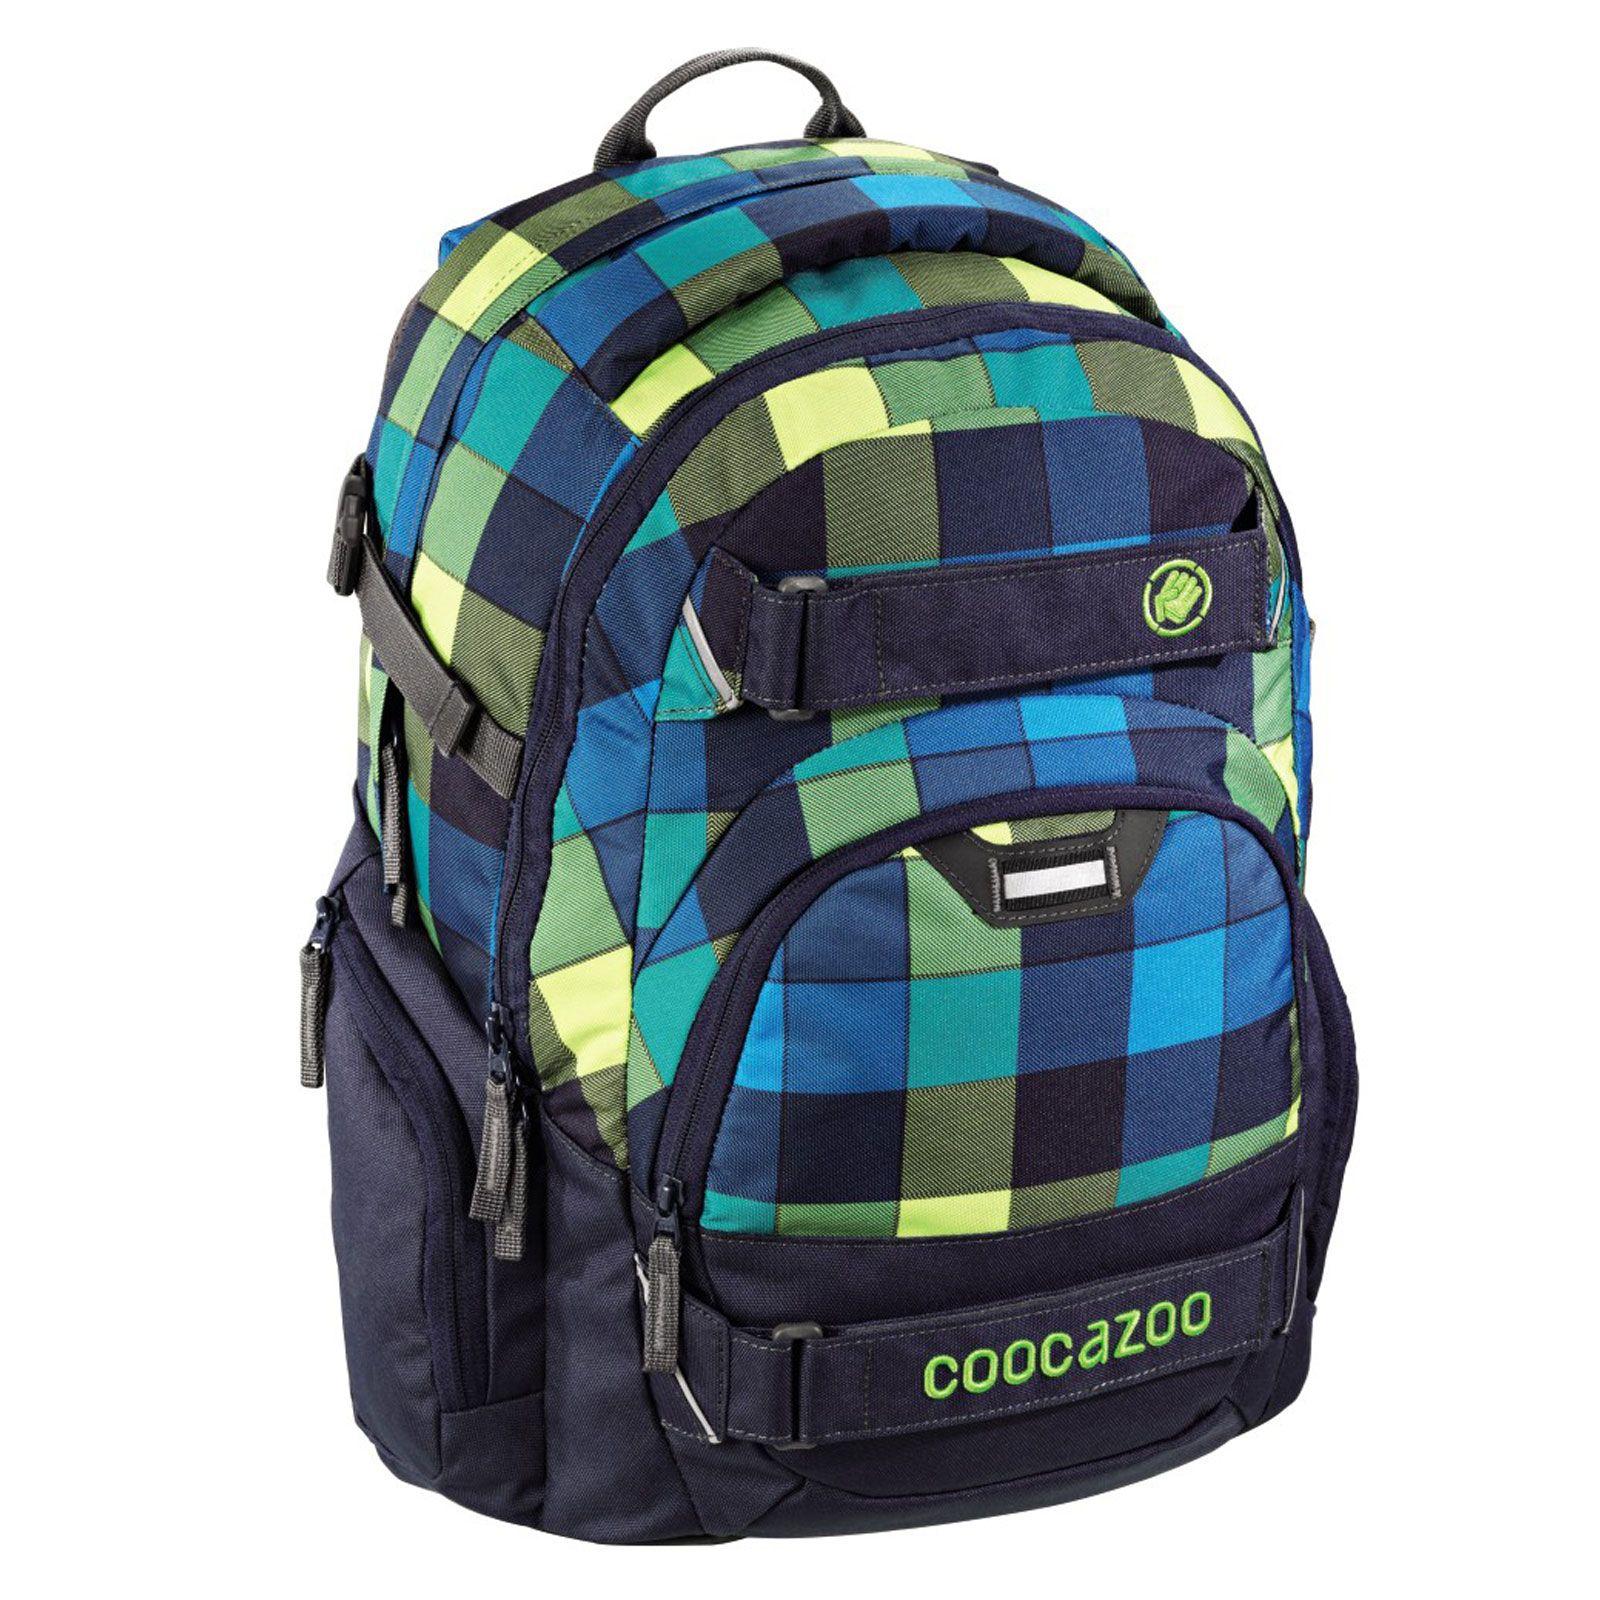 Школьный рюкзак coocazoo evverclevver blue broken рюкзак swiss polo